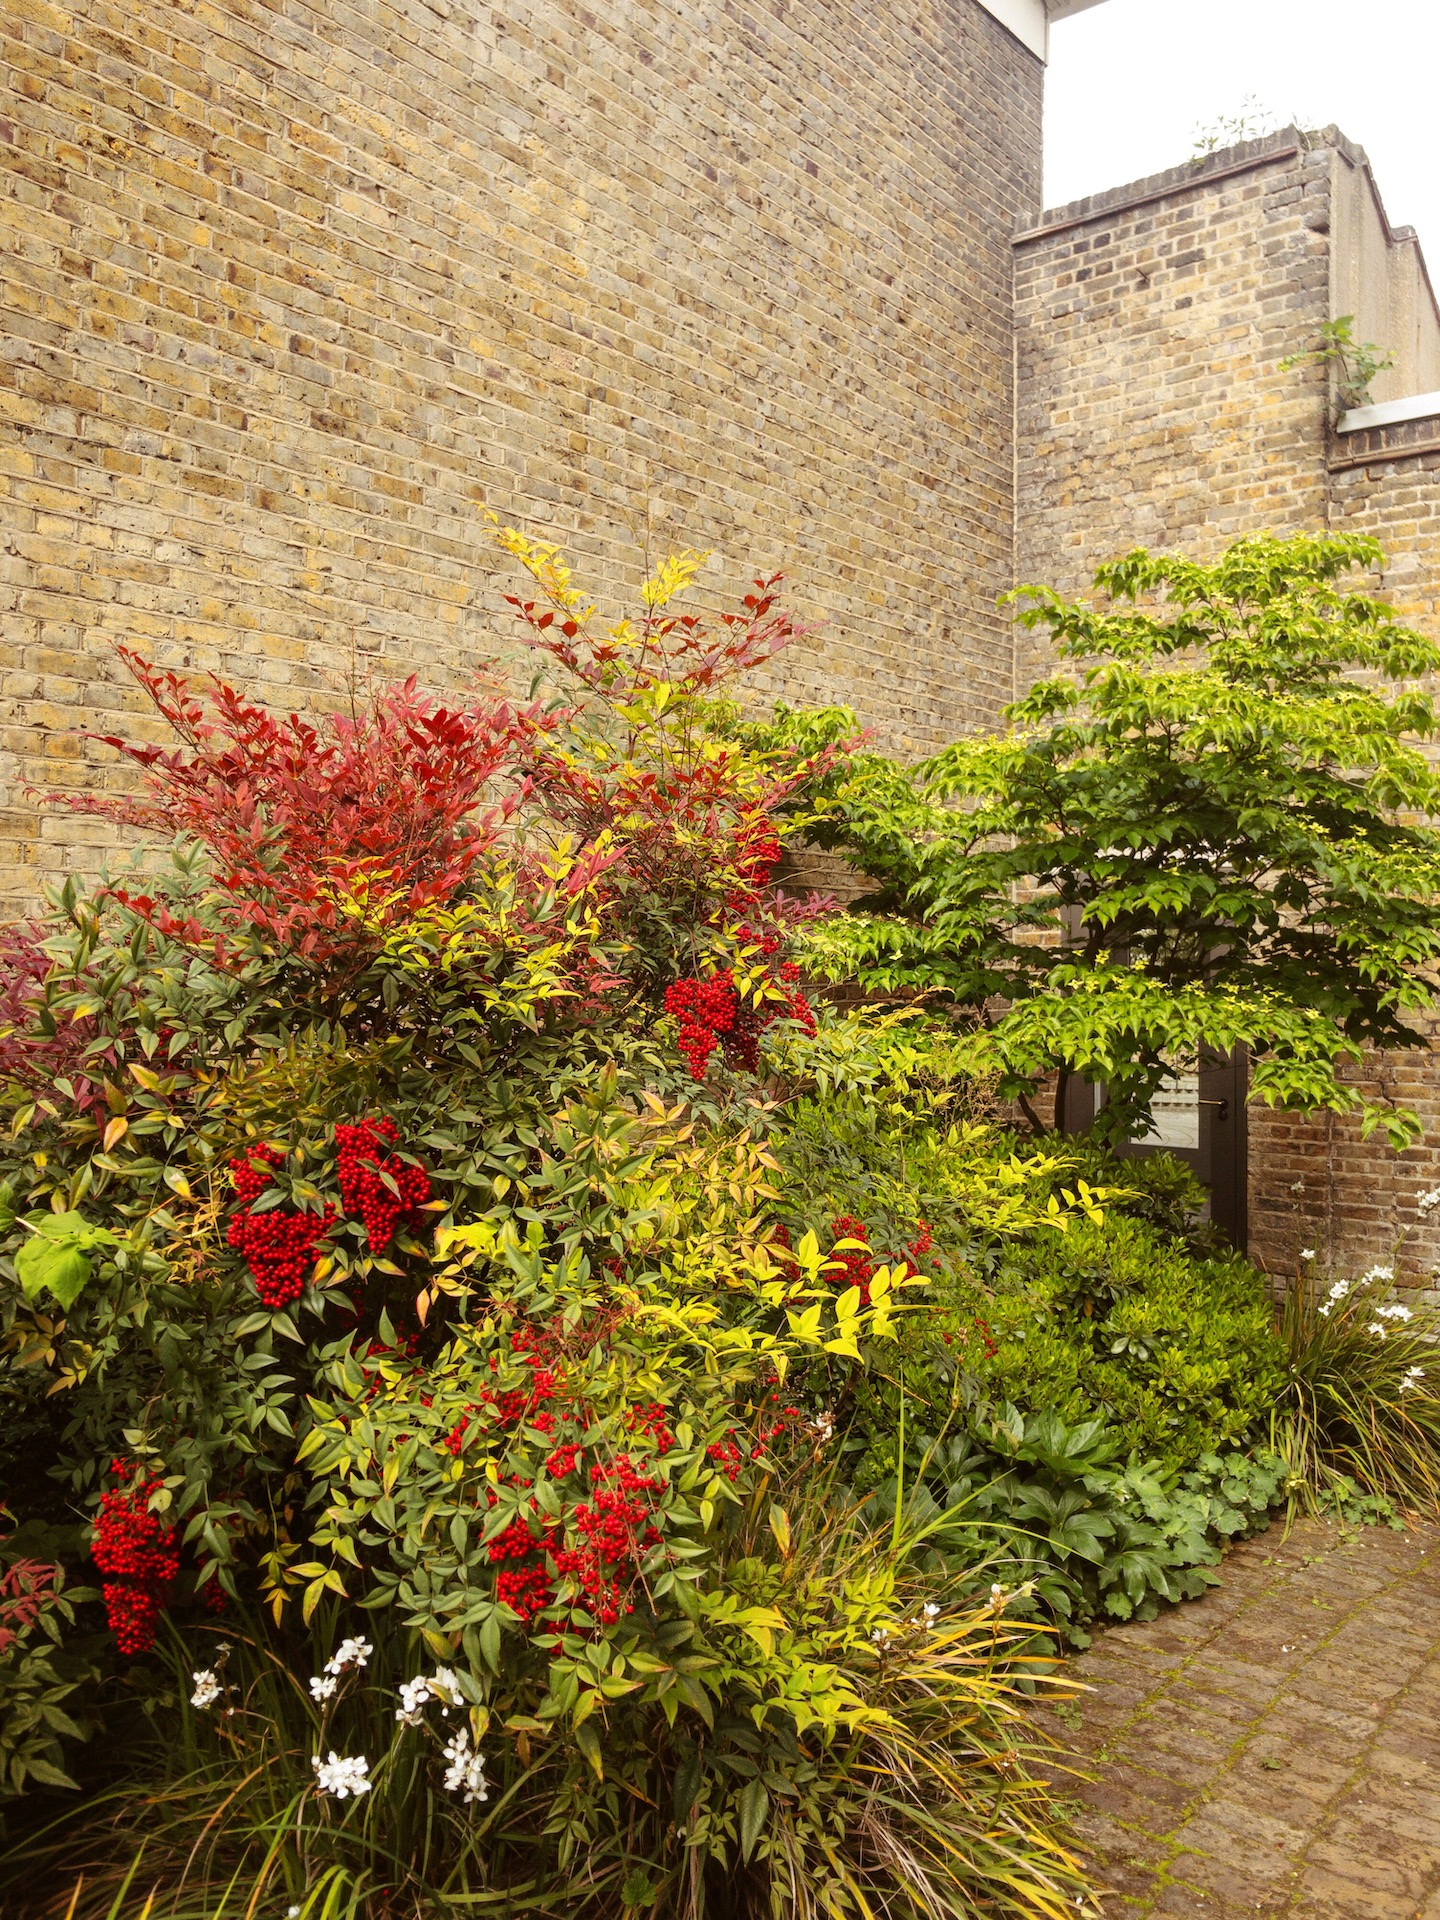 South London Gallery Secret Back Garden - What Dominika Did.JPG